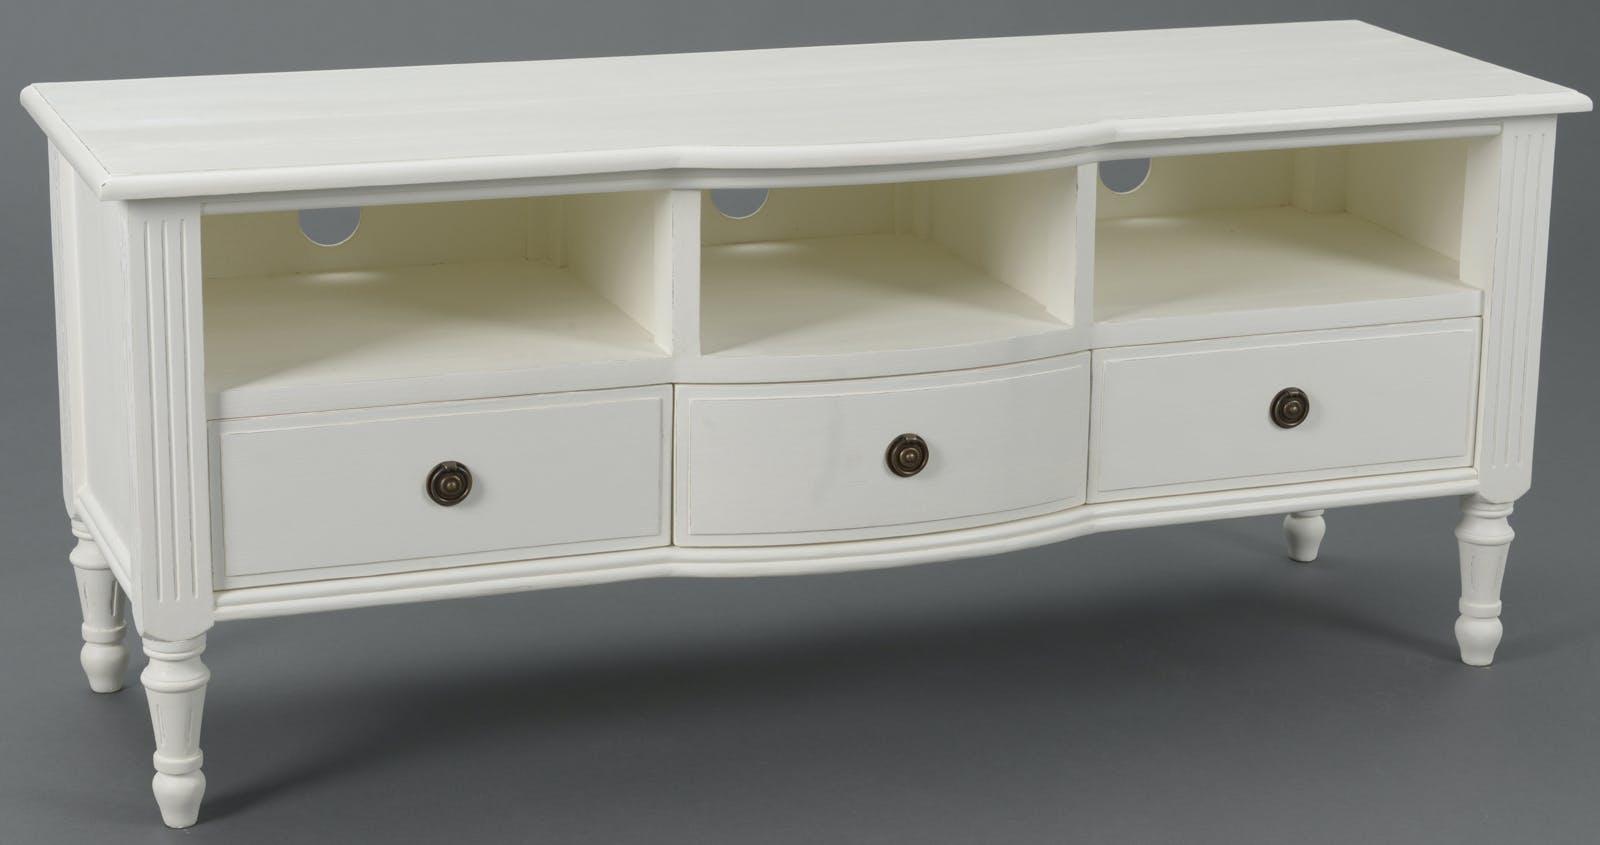 Meuble TV Classique Chic 3 tiroirs, 3 niches AGATHE 120x40x50cm Blanc Antique AMADEUS